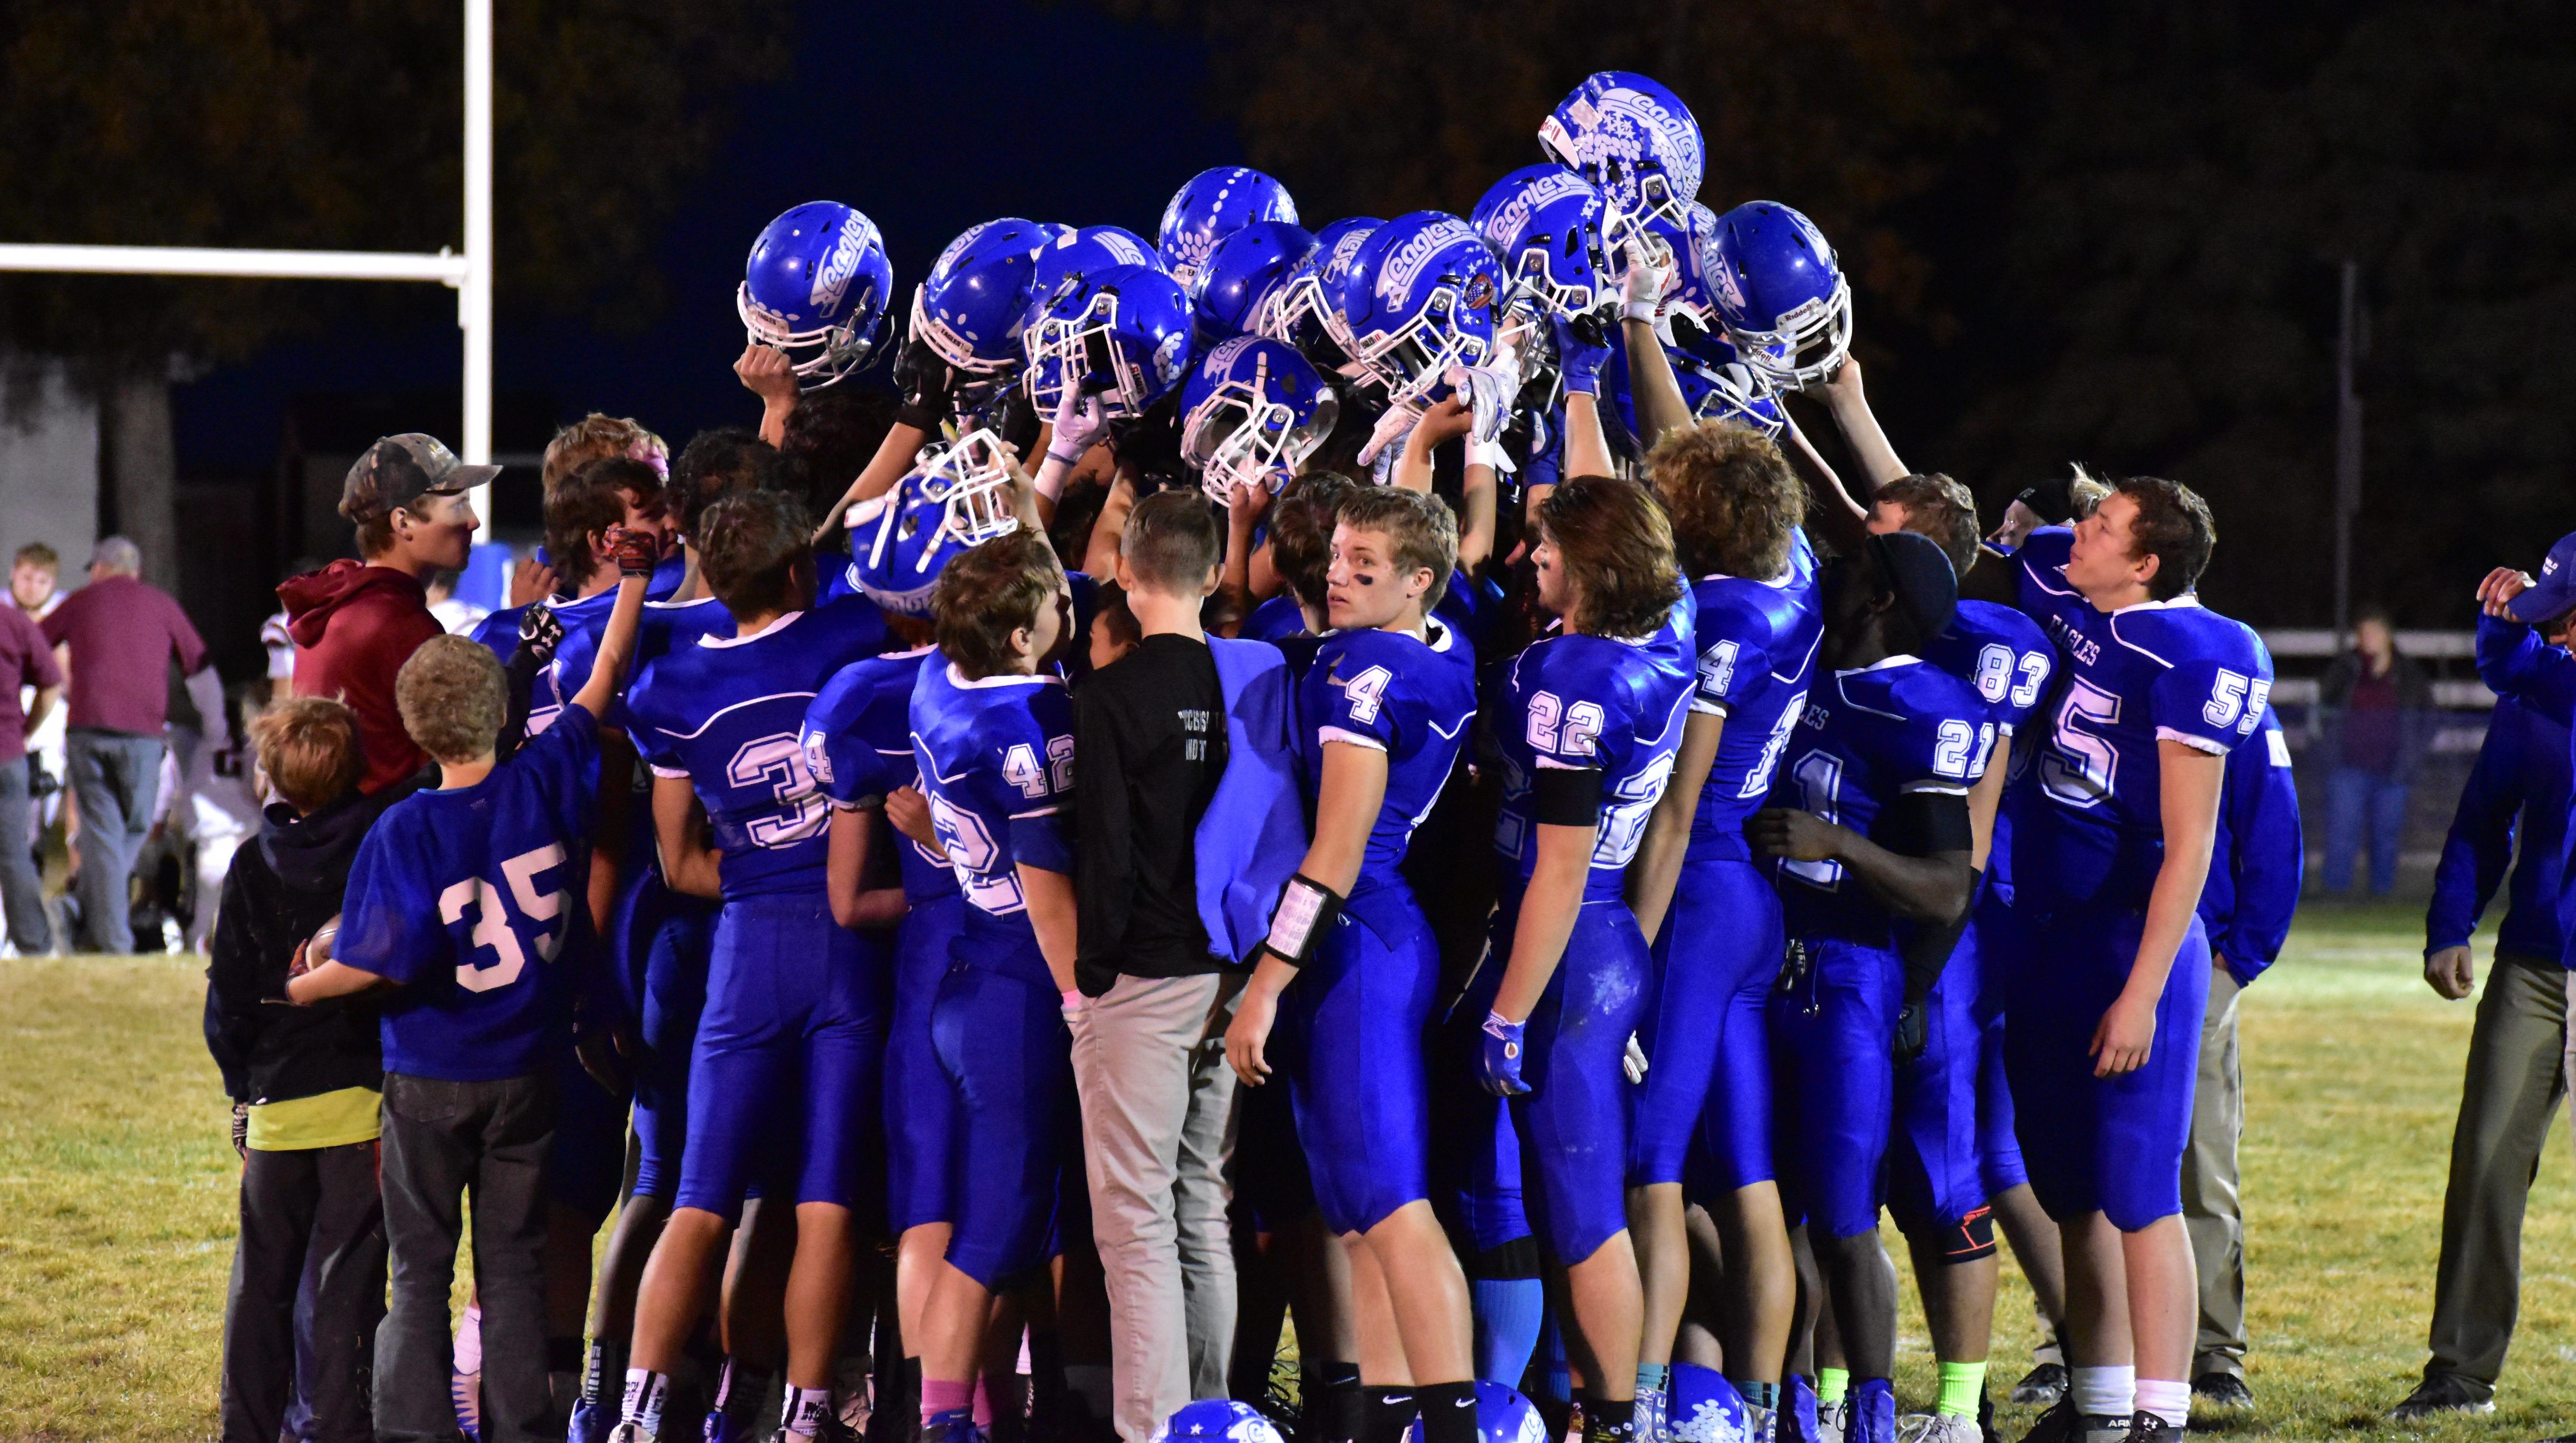 The Fairfield football team celebrates a victory over Wolf Point Thursday night.